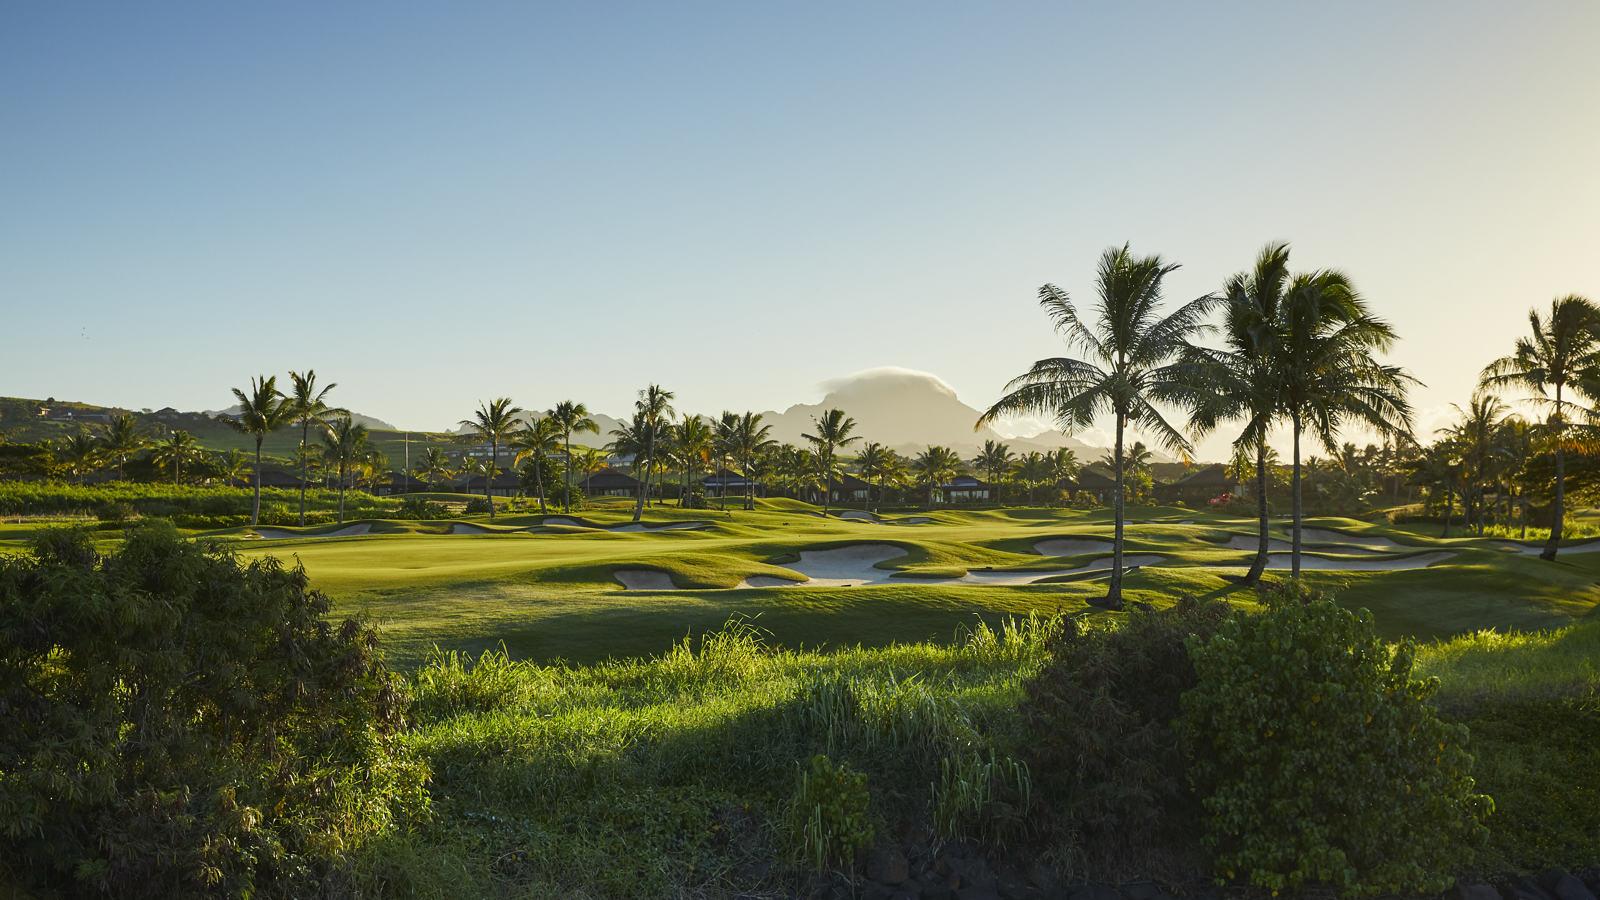 Kauai golf course view